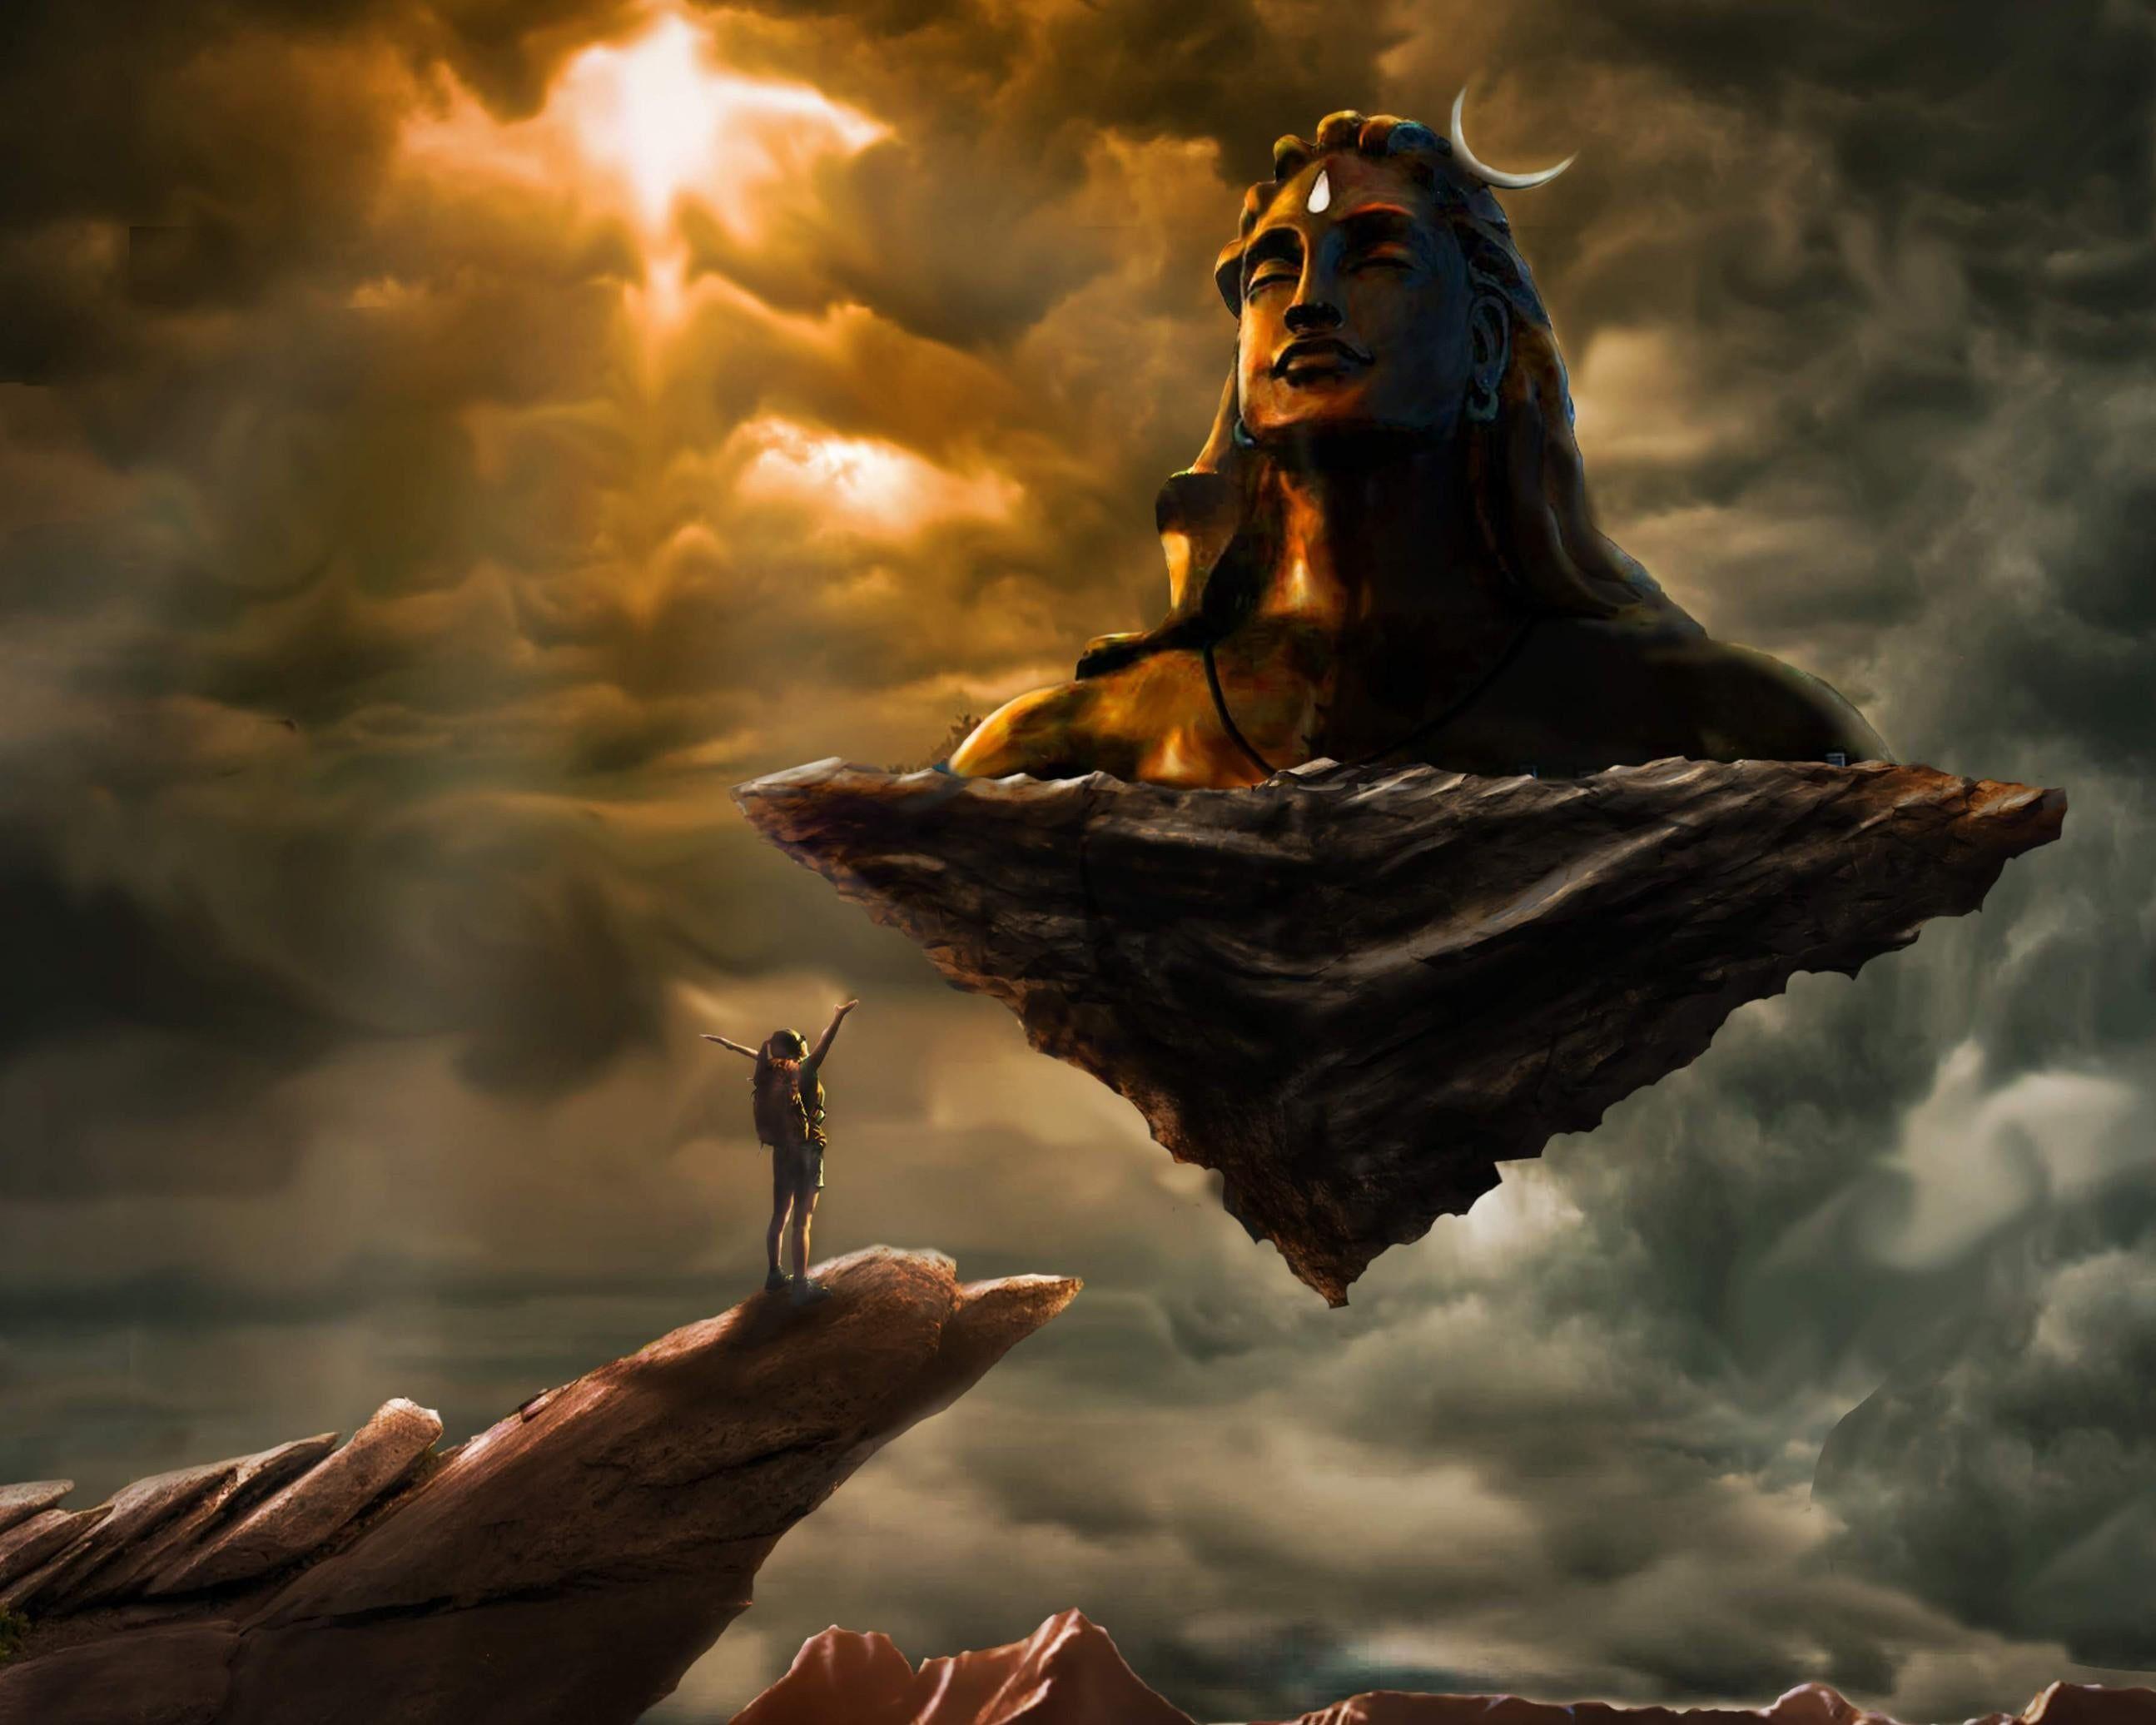 Https Lordshivahdwallpapersimages Blogspot Com Lord Shiva Pics Shiva Wallpaper Lord Shiva Hd Images